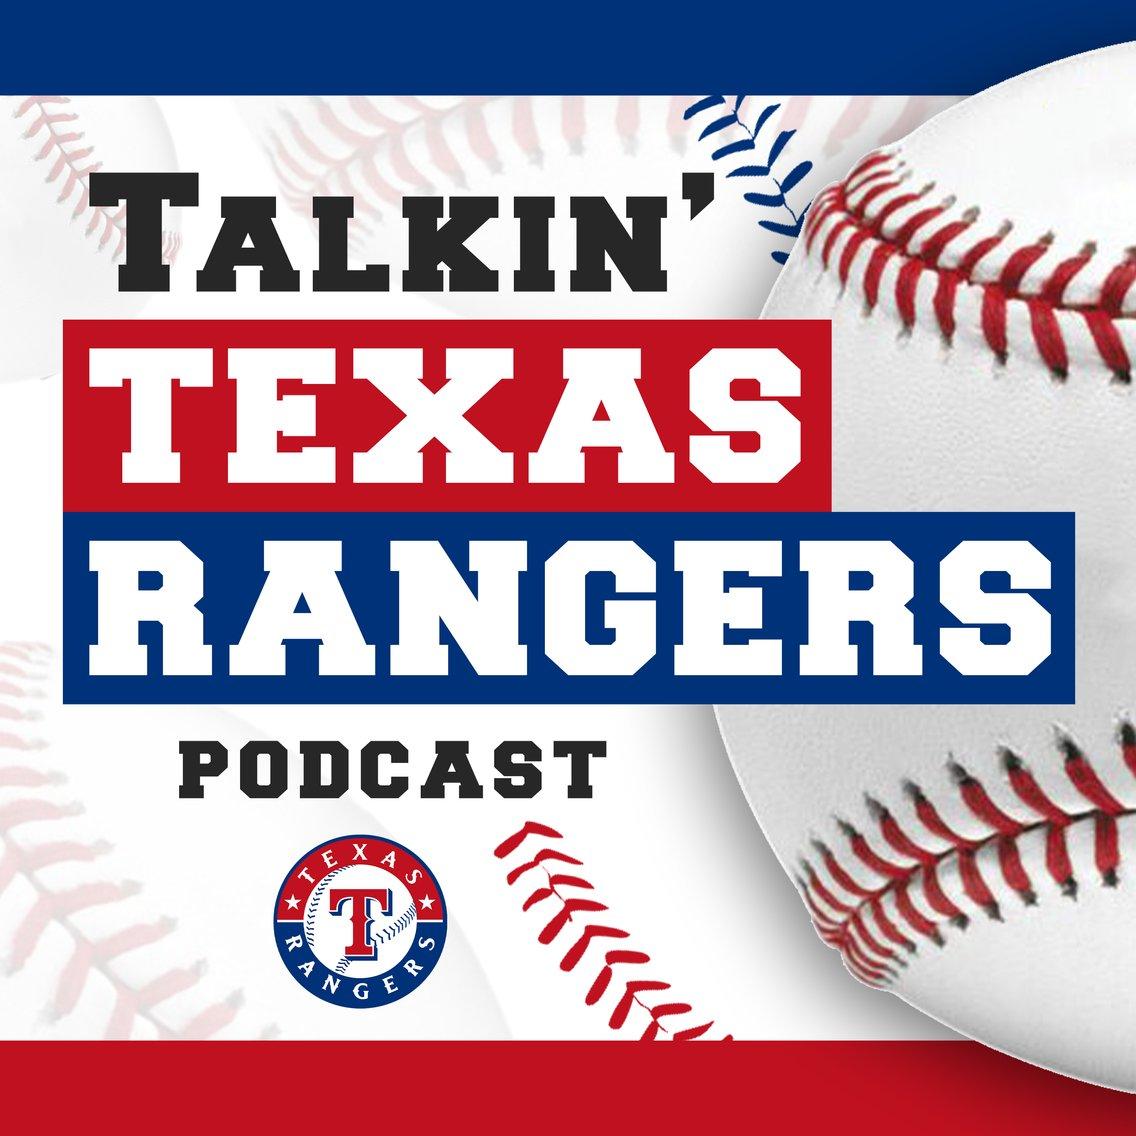 Talkin Texas Rangers - imagen de portada